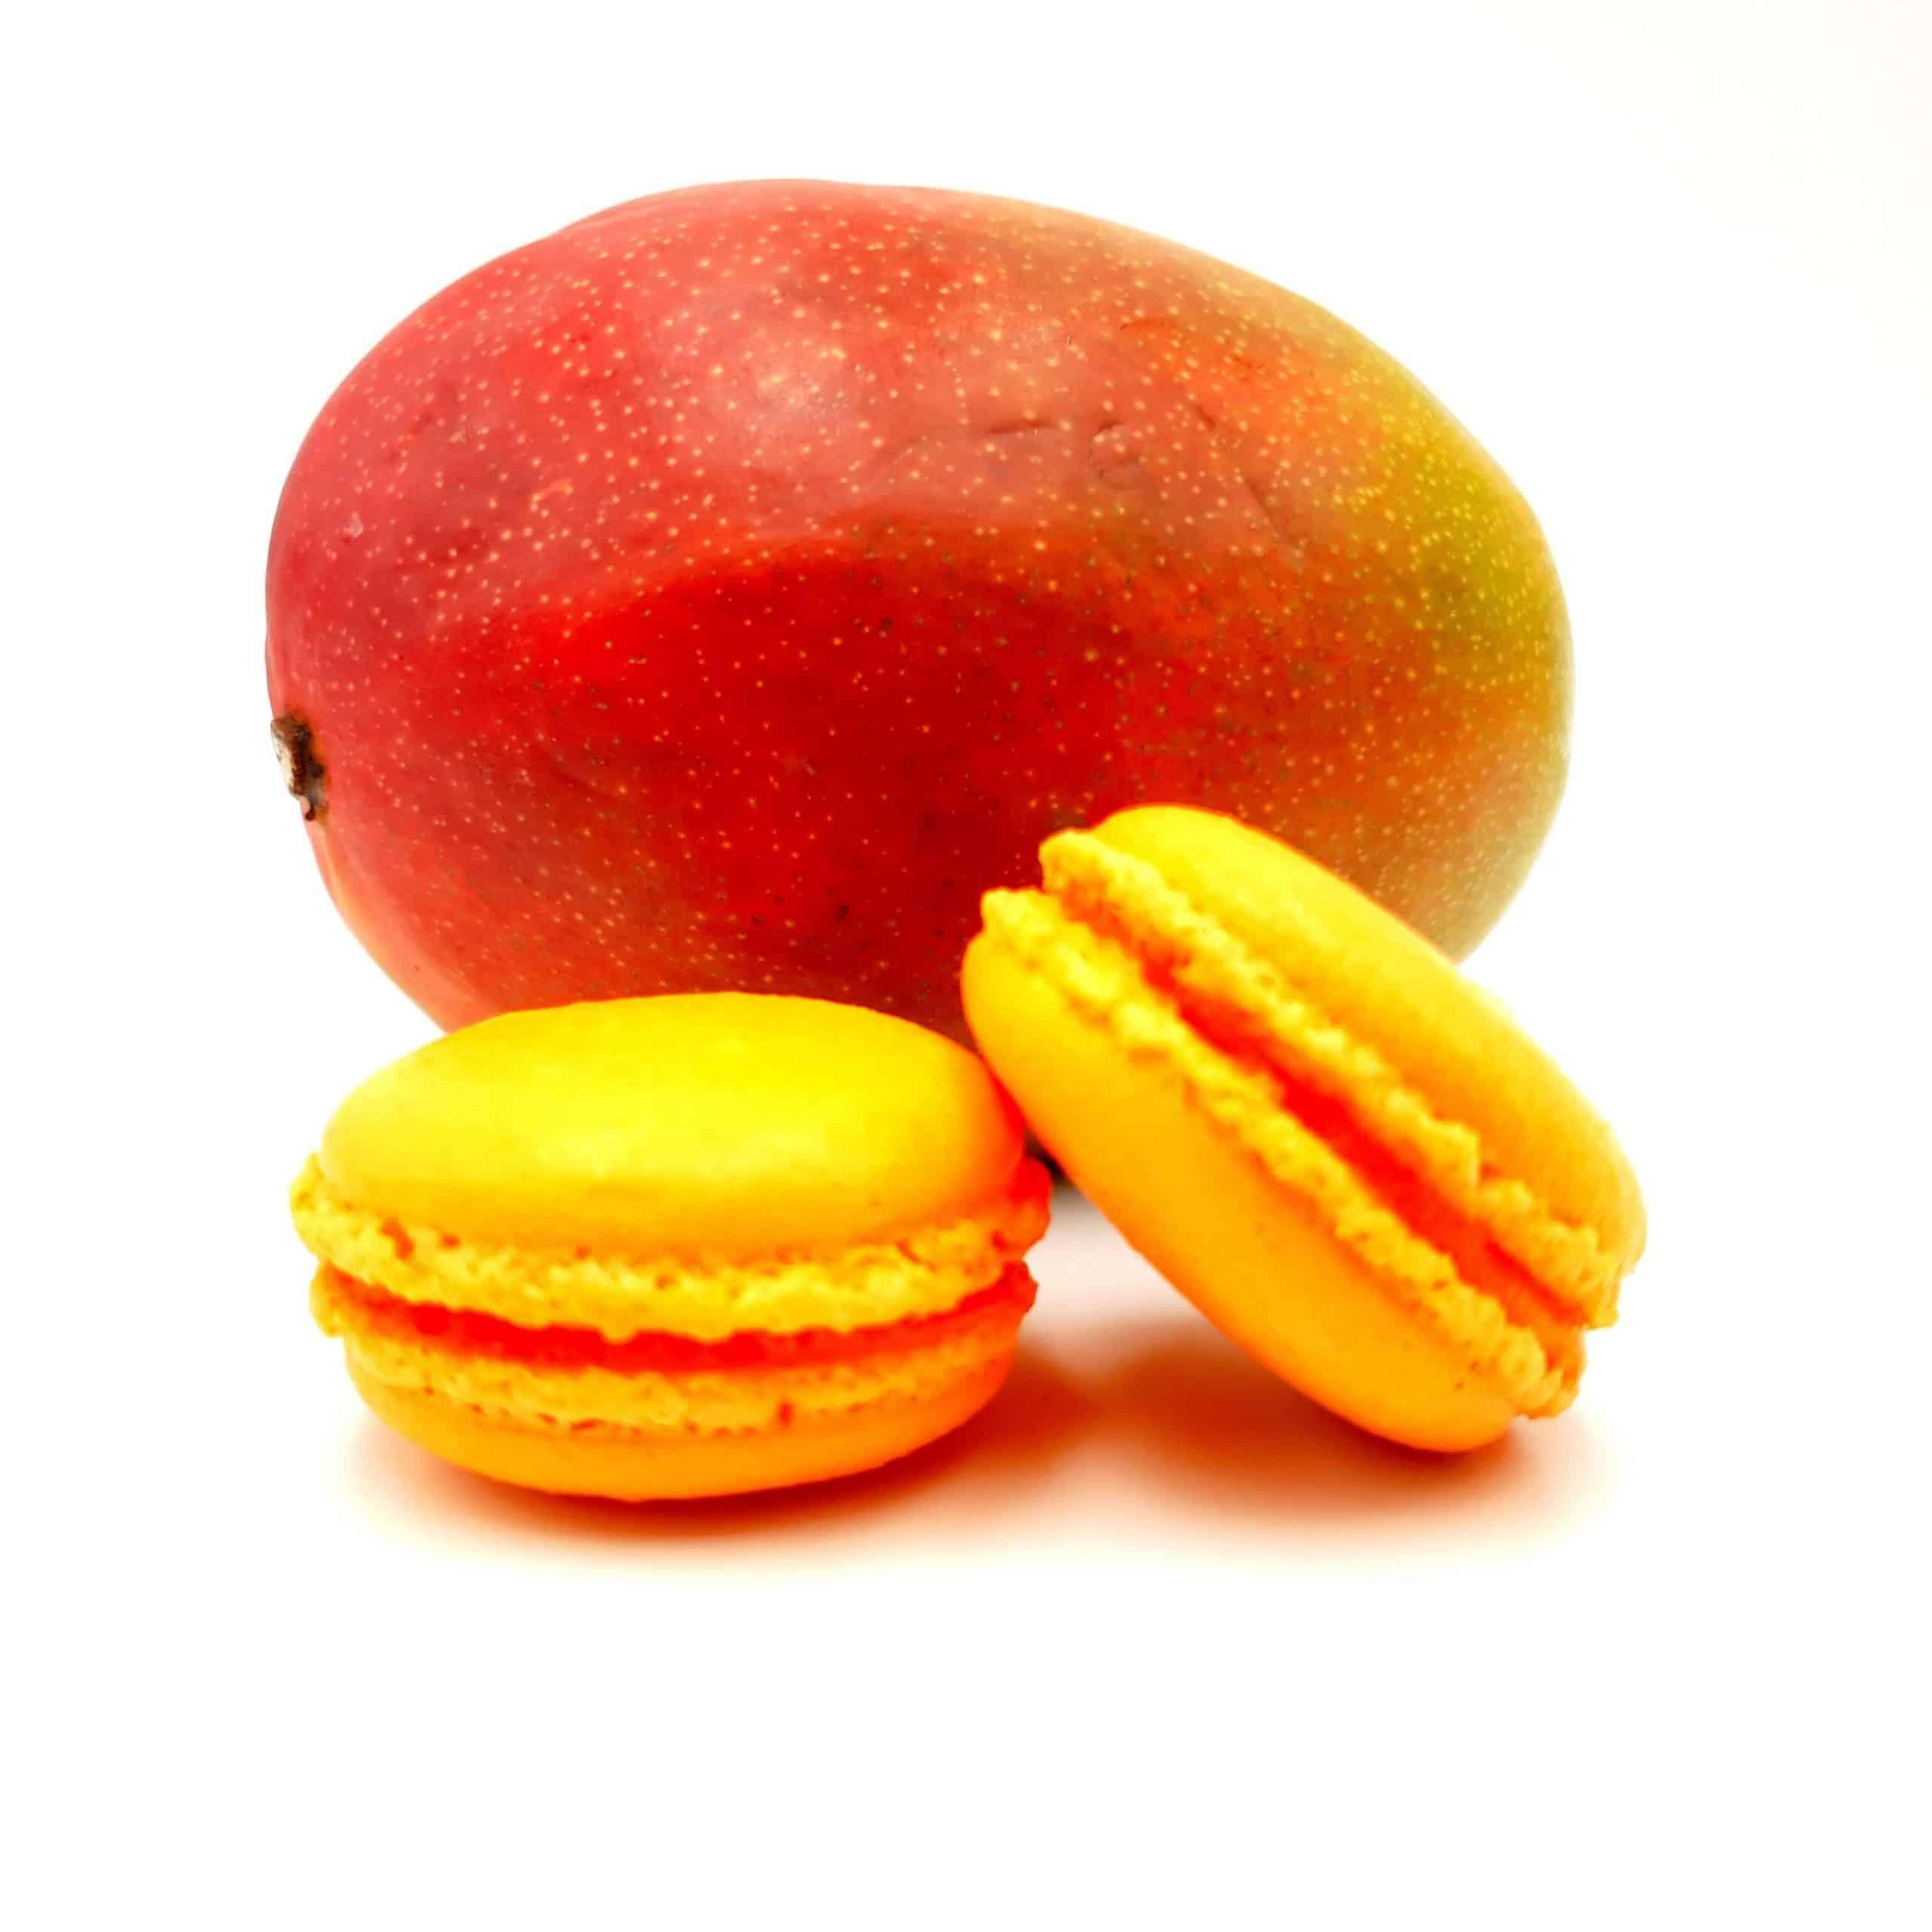 Macaron mangue